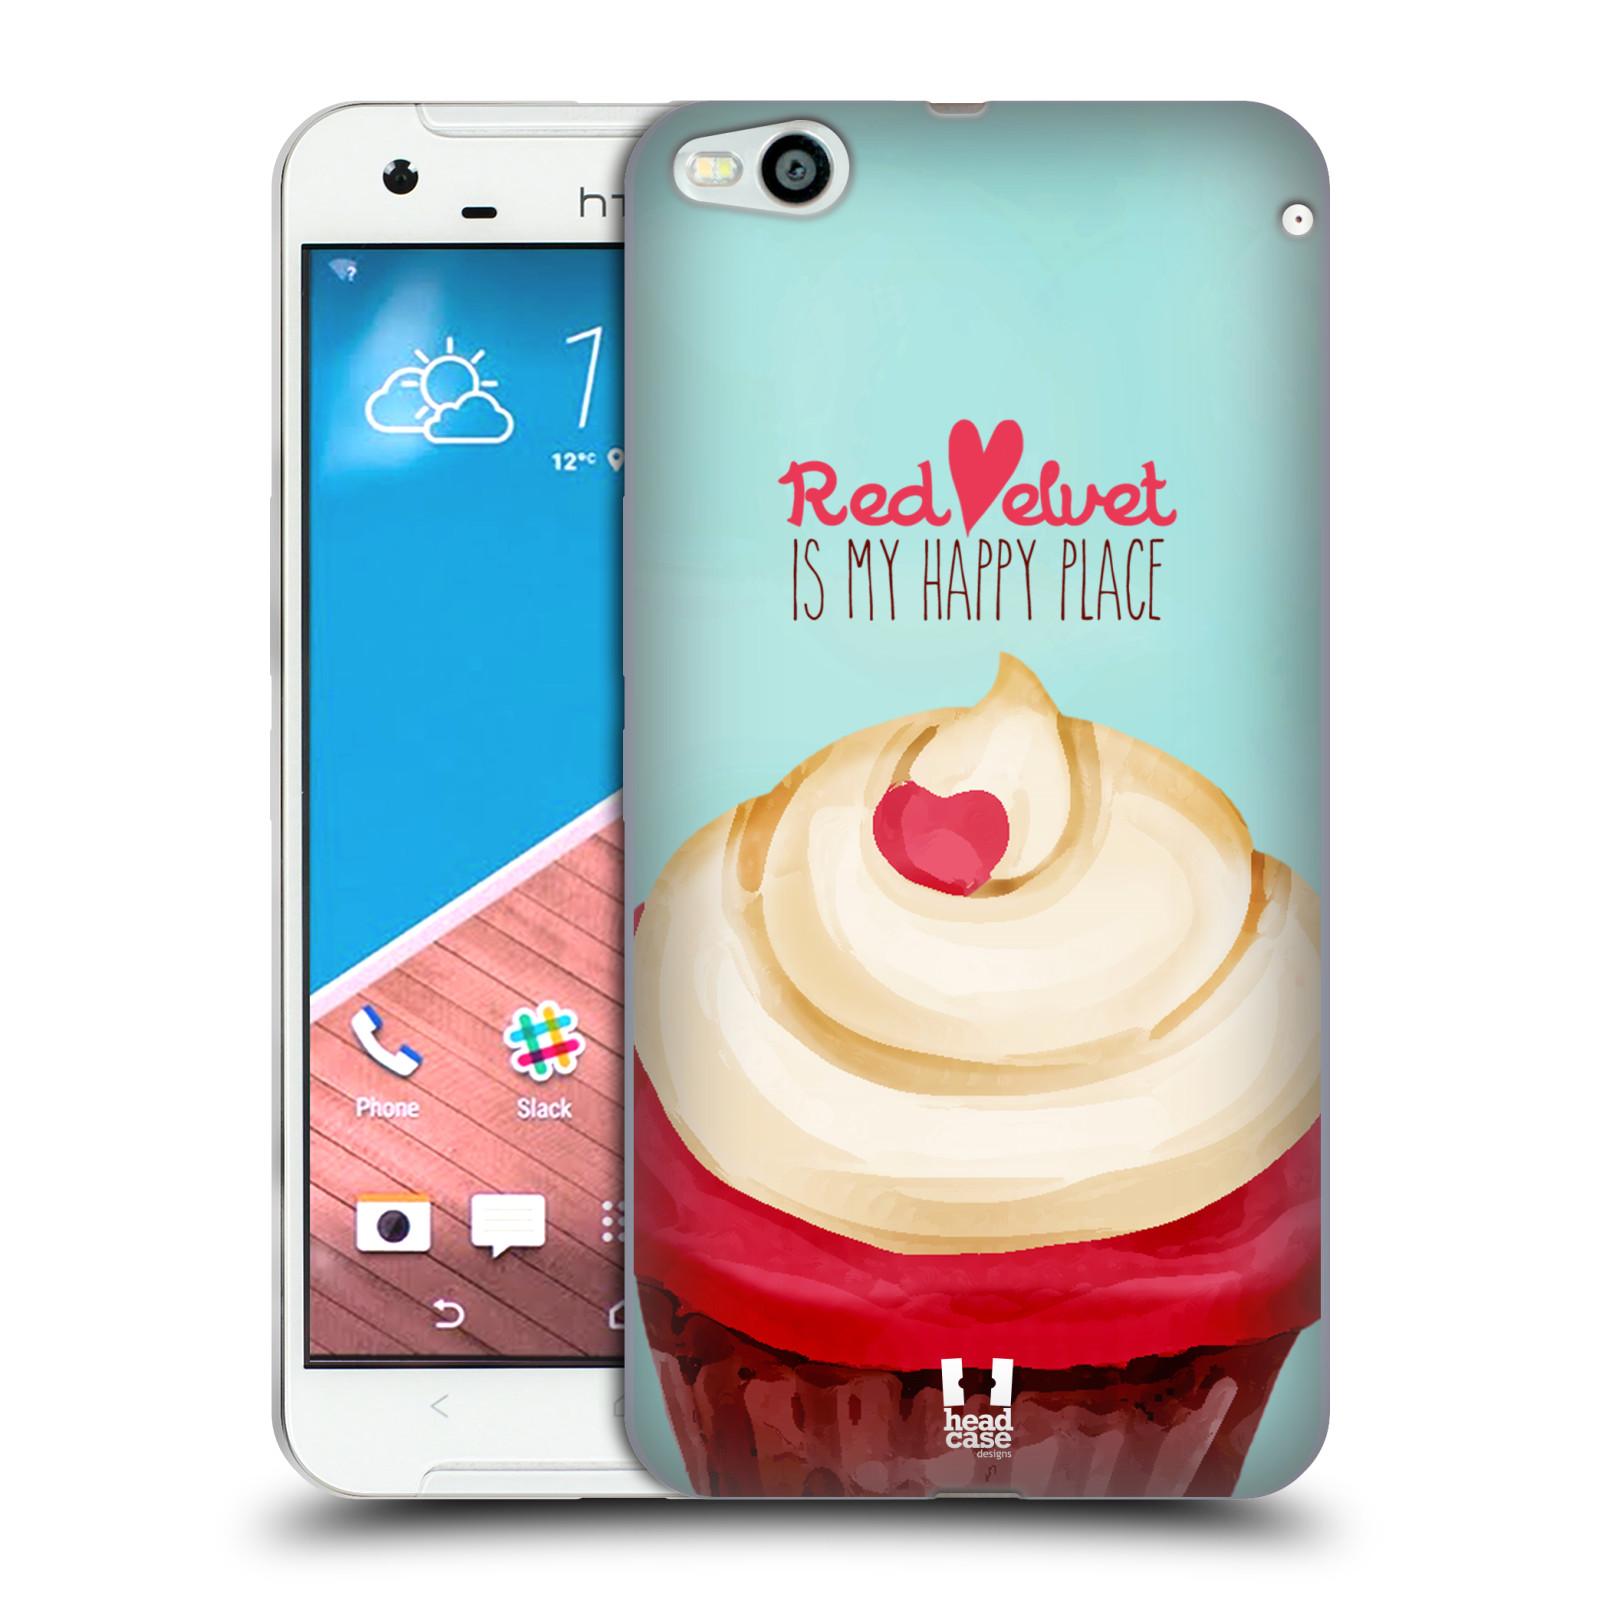 Silikonové pouzdro na mobil HTC One X9 HEAD CASE CUPCAKE RED VELVET (Silikonový kryt či obal na mobilní telefon HTC One X9)